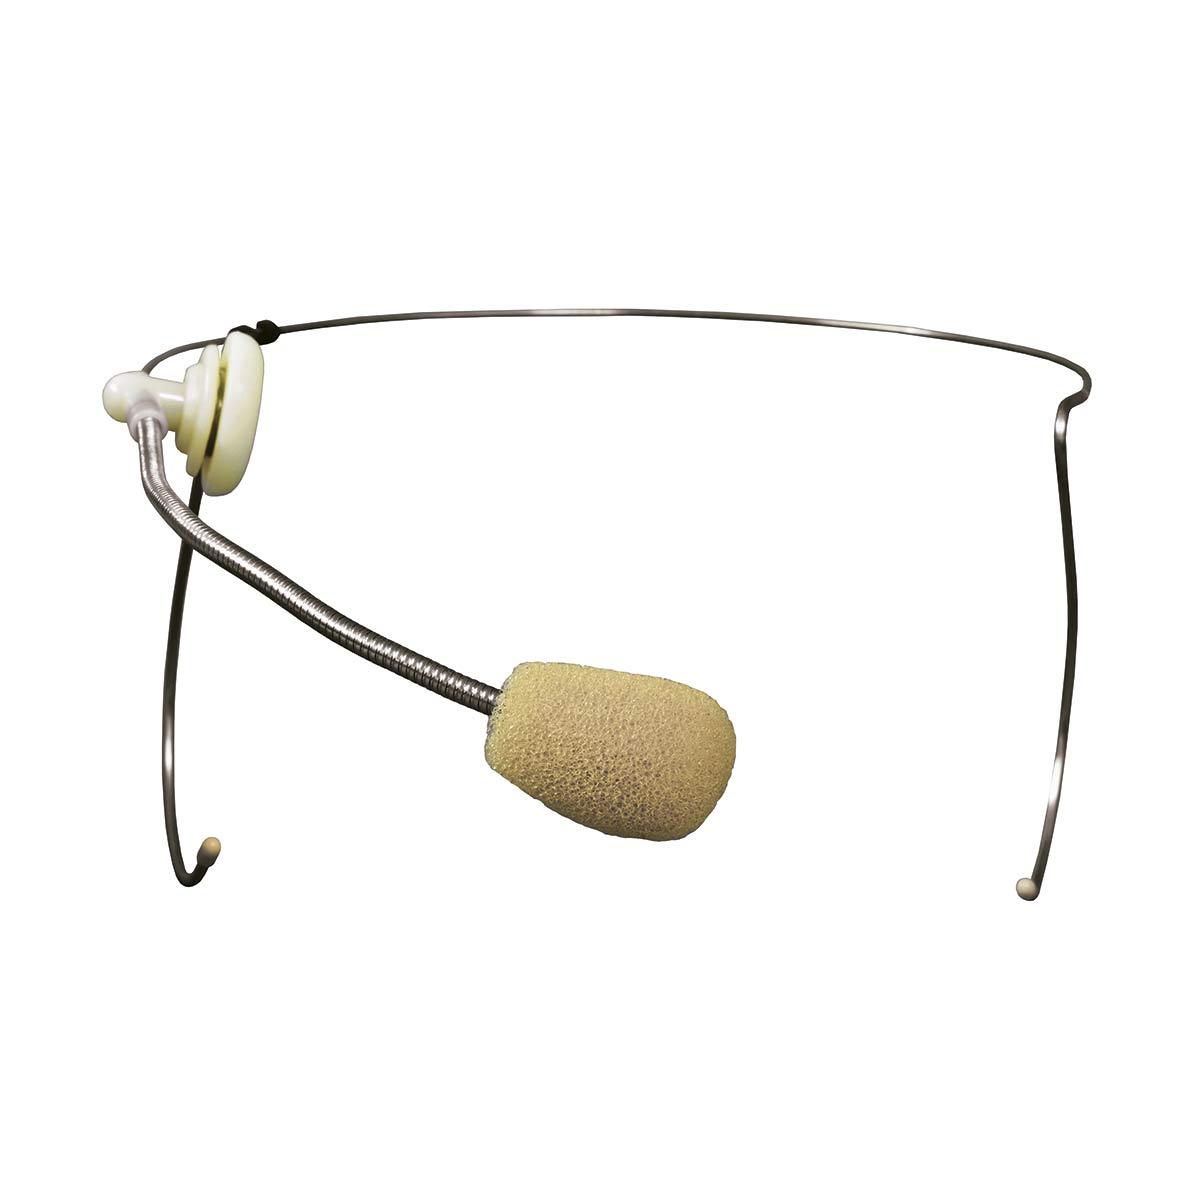 Microfone c/ Fio Headset / Cabeça HMG-02 - SKP